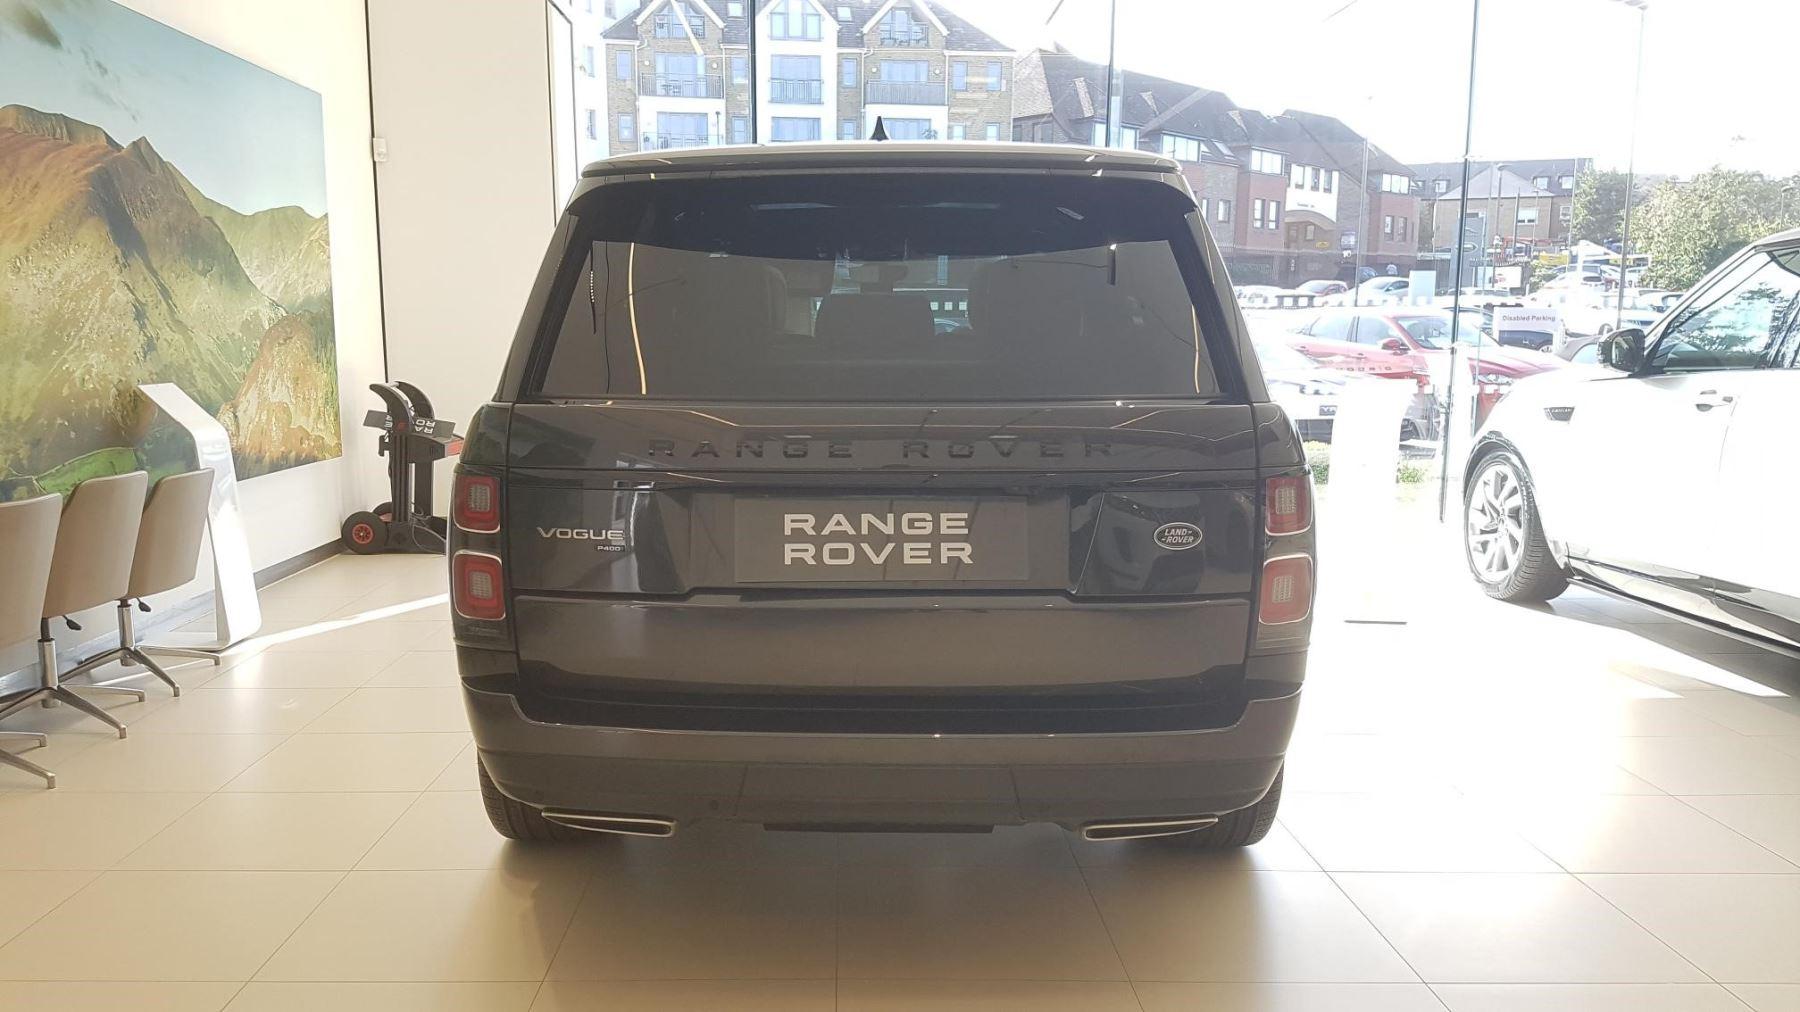 Land Rover Range Rover 3.0 P400 Vogue image 5